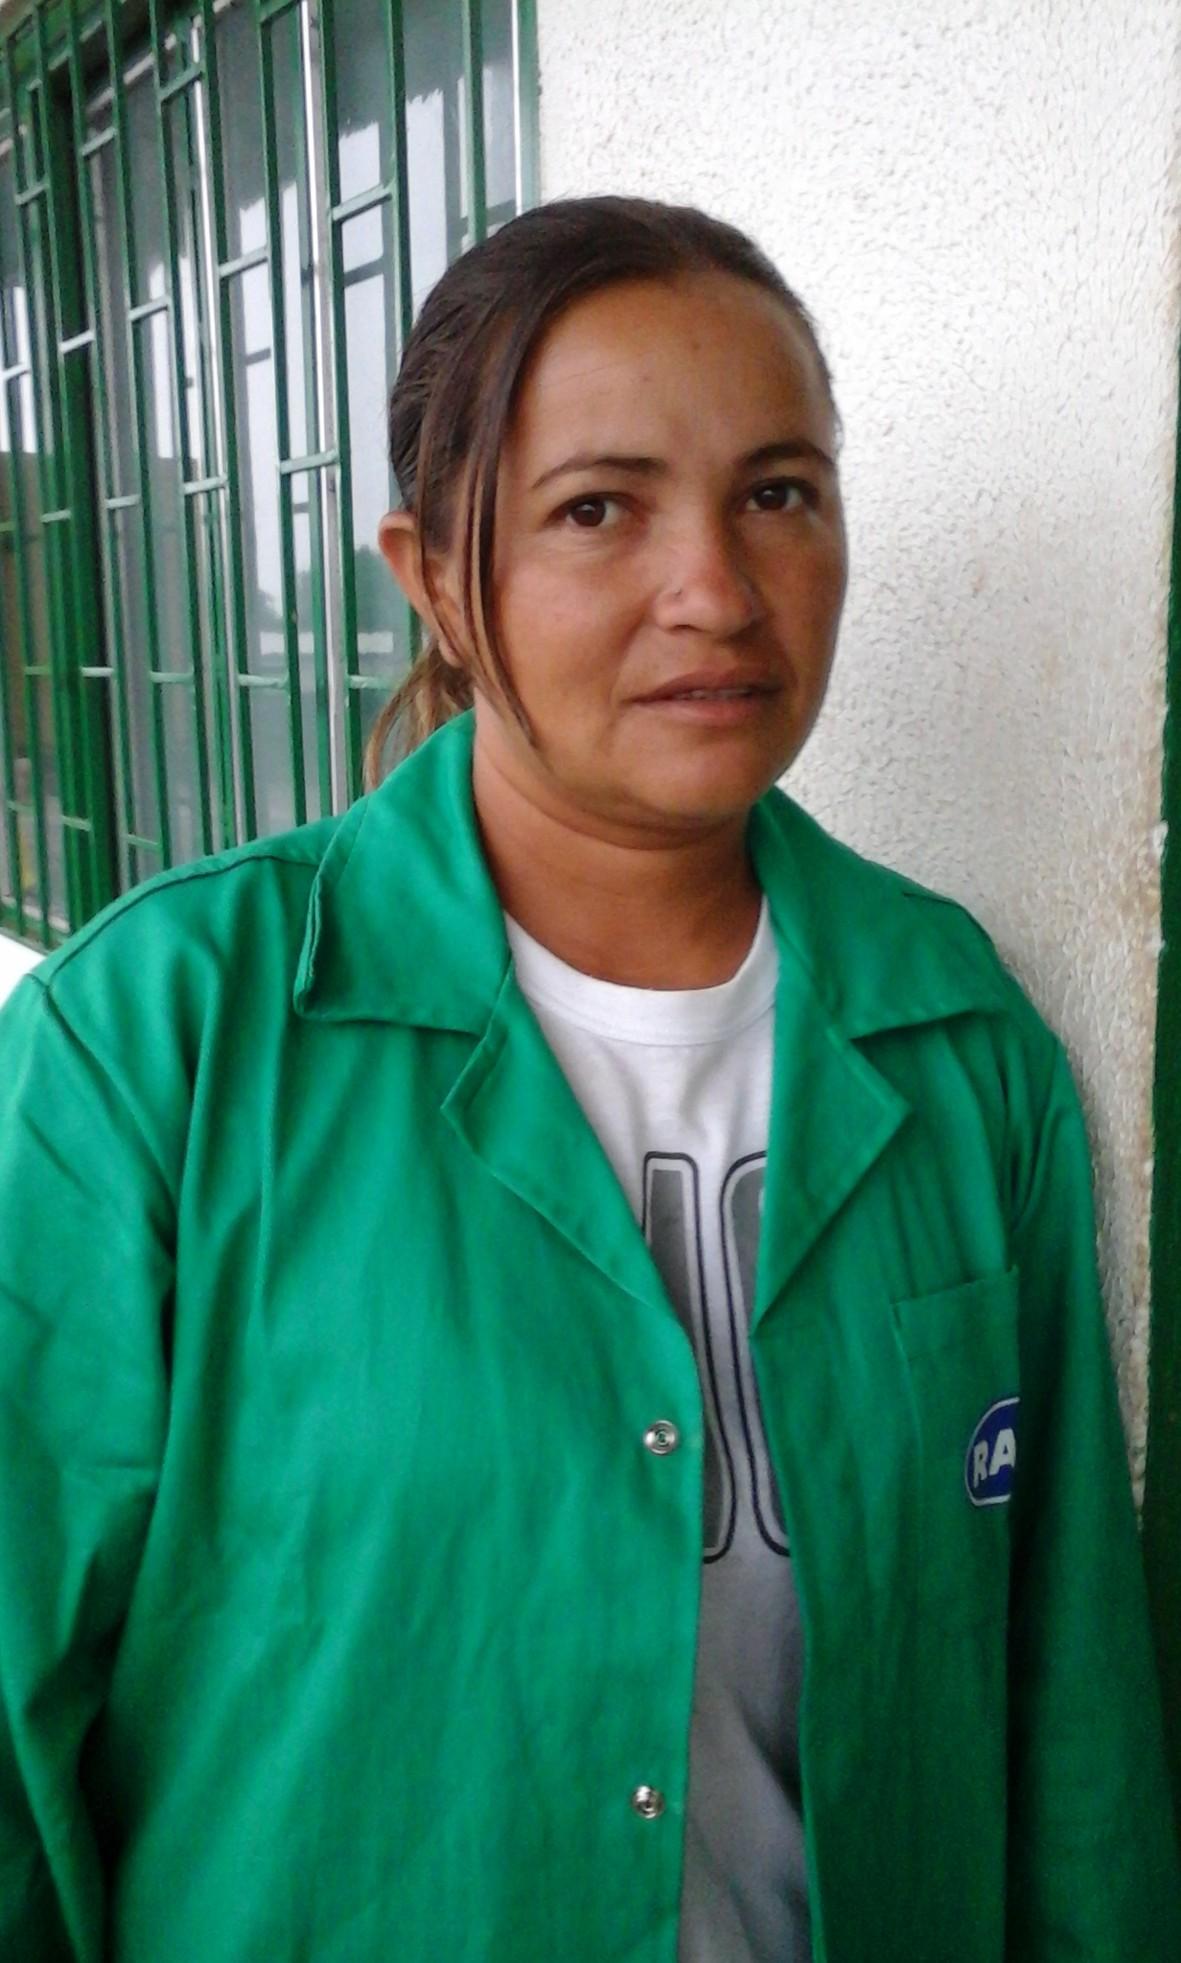 Graciele Rodriguez de Souza, 30 anos